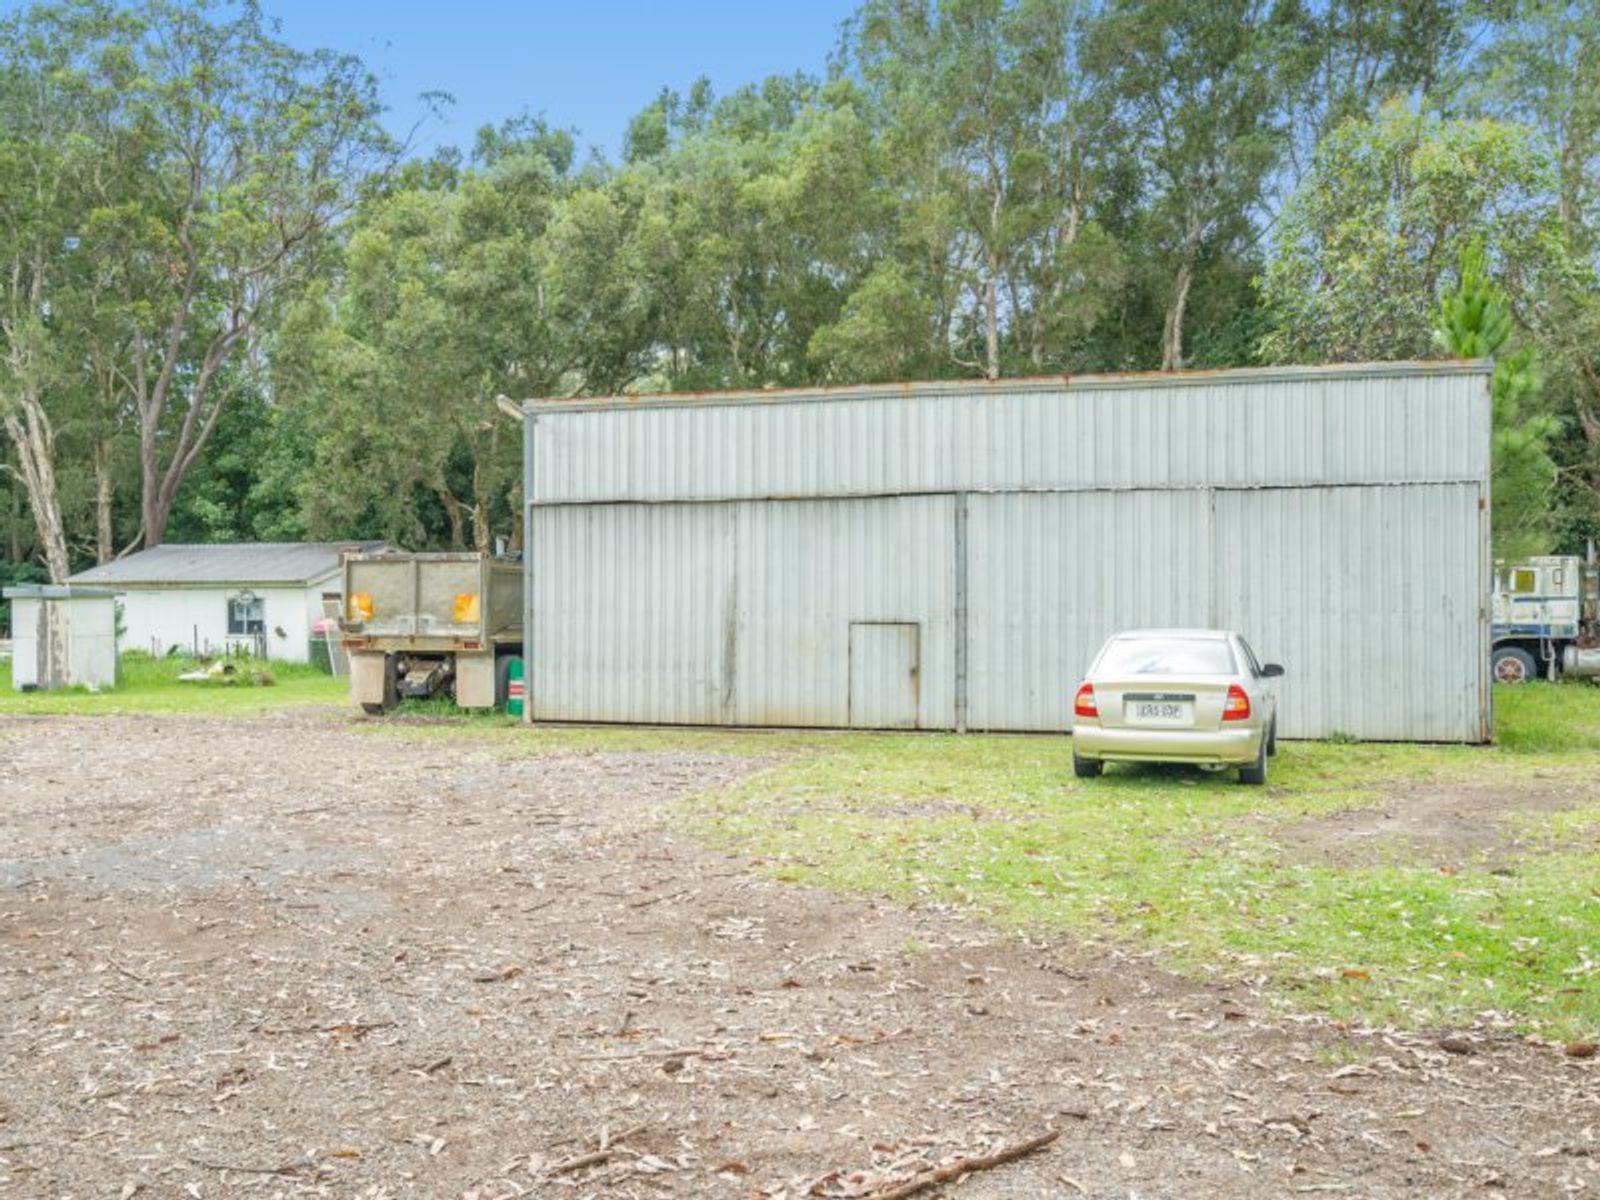 169 Pollock Avenue, Wyong, NSW 2259